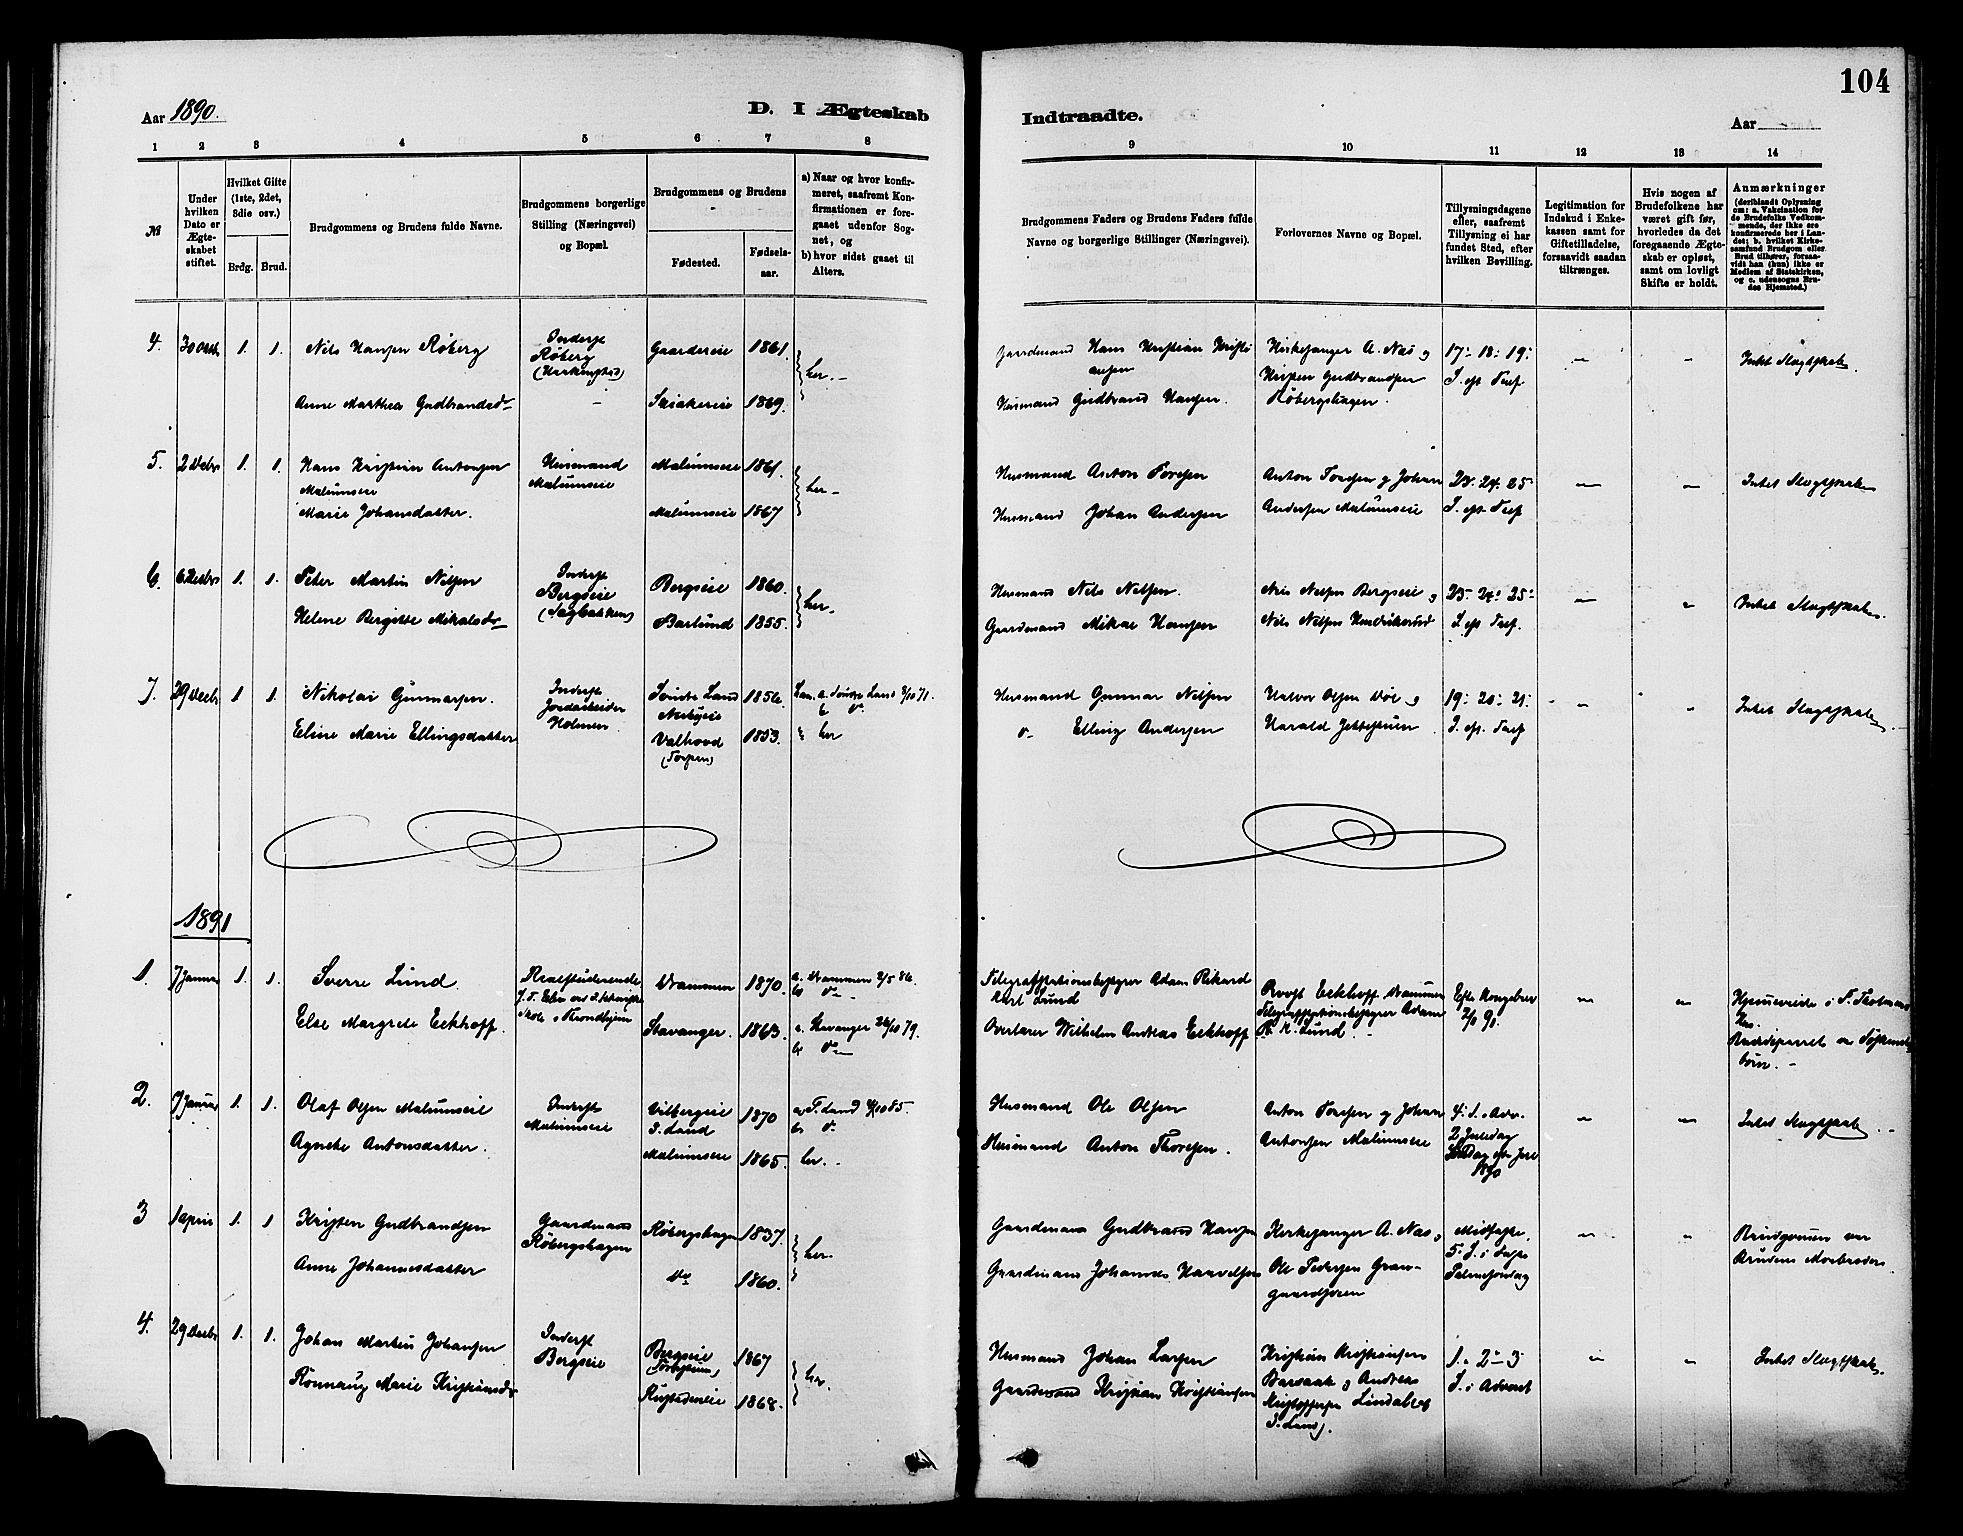 SAH, Nordre Land prestekontor, Ministerialbok nr. 3, 1882-1896, s. 104